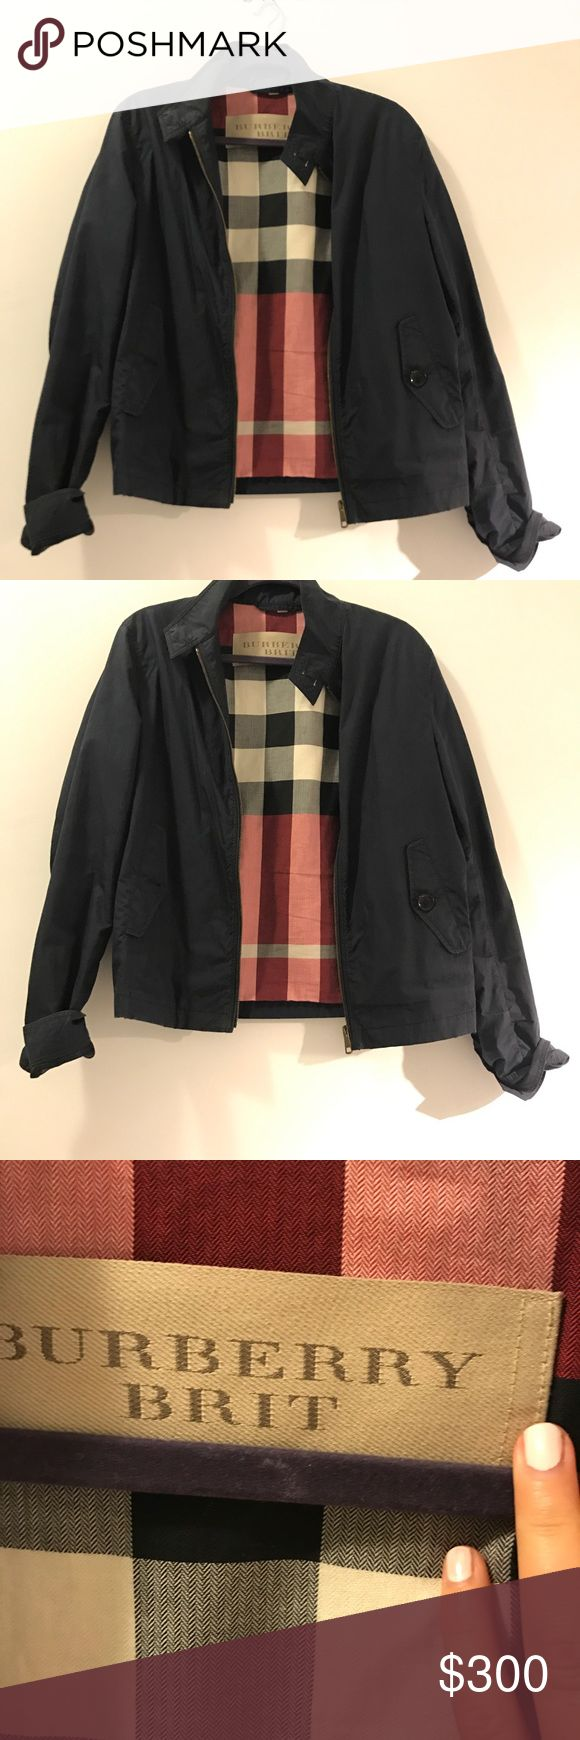 Burberry Brit Jacket Burberry Brit Jacket navy cotton bomber jacket - men's but I wear it too 🙂 Burberry Jackets & Coats